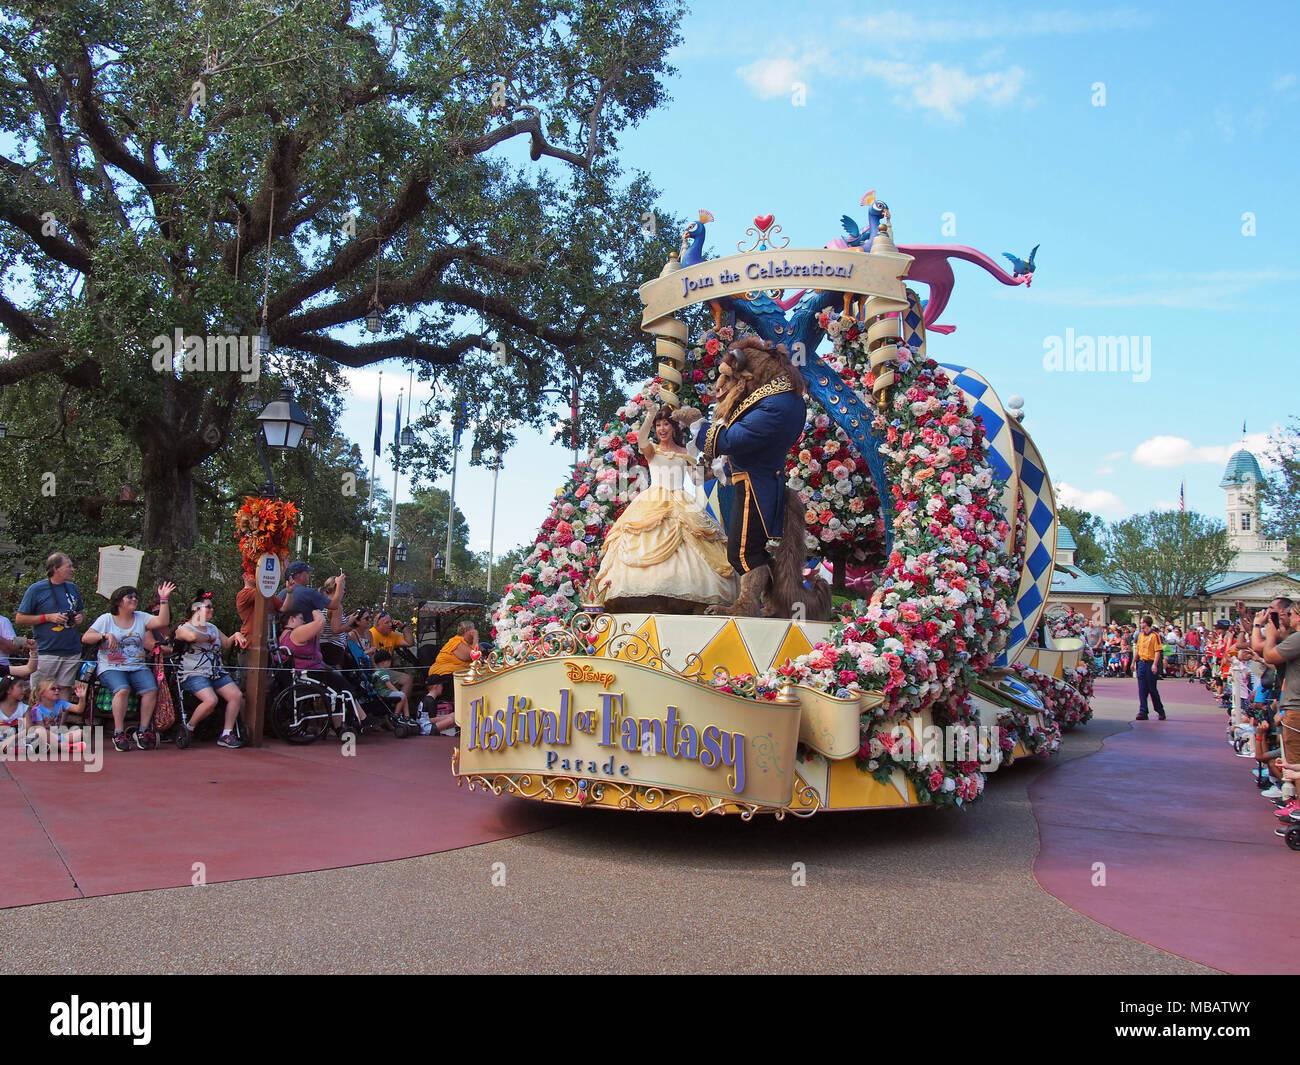 Festival of Fantasy Parade at Walt Disney World Magic Kingdom, Orlando, Florida 2017 © Katharine Andriotis - Stock Image